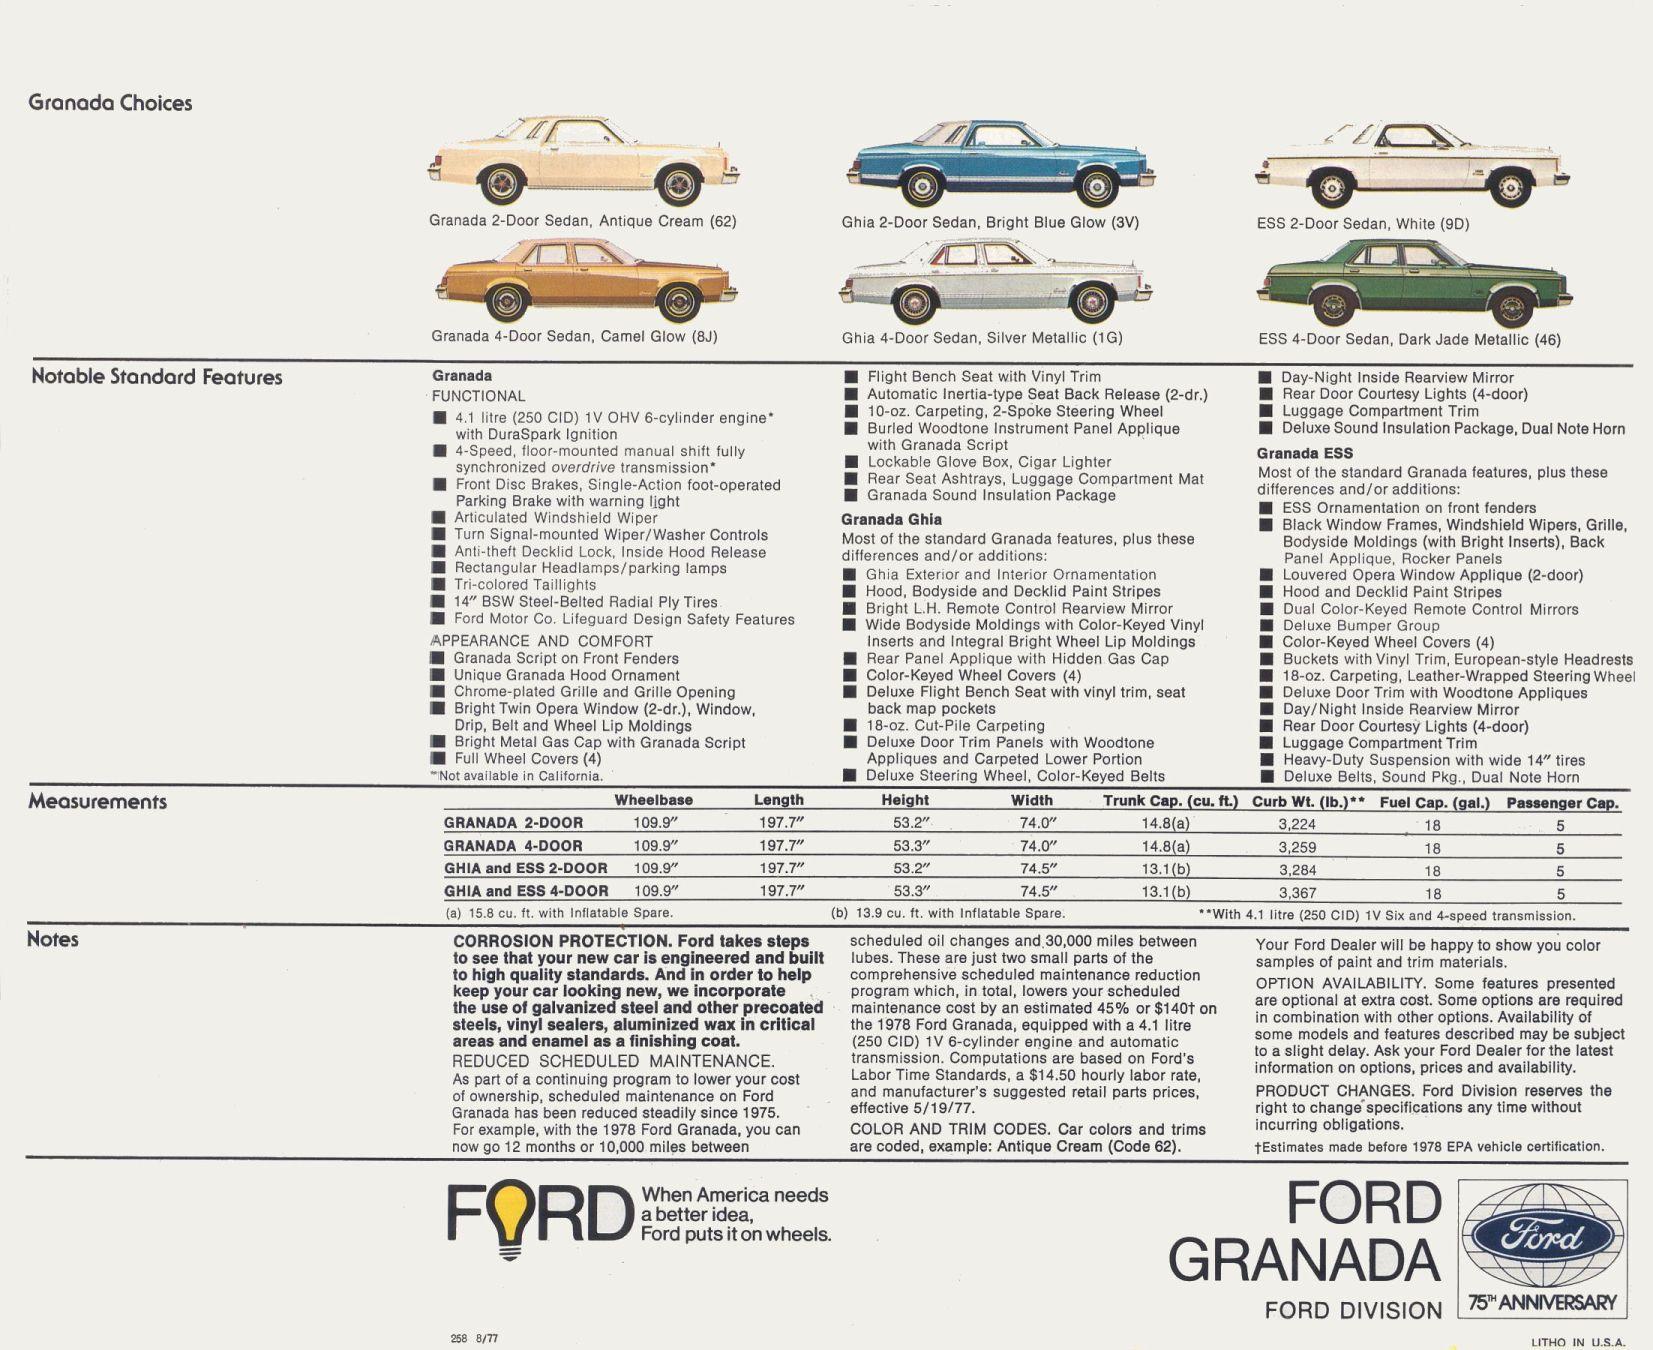 ford granada характеристики